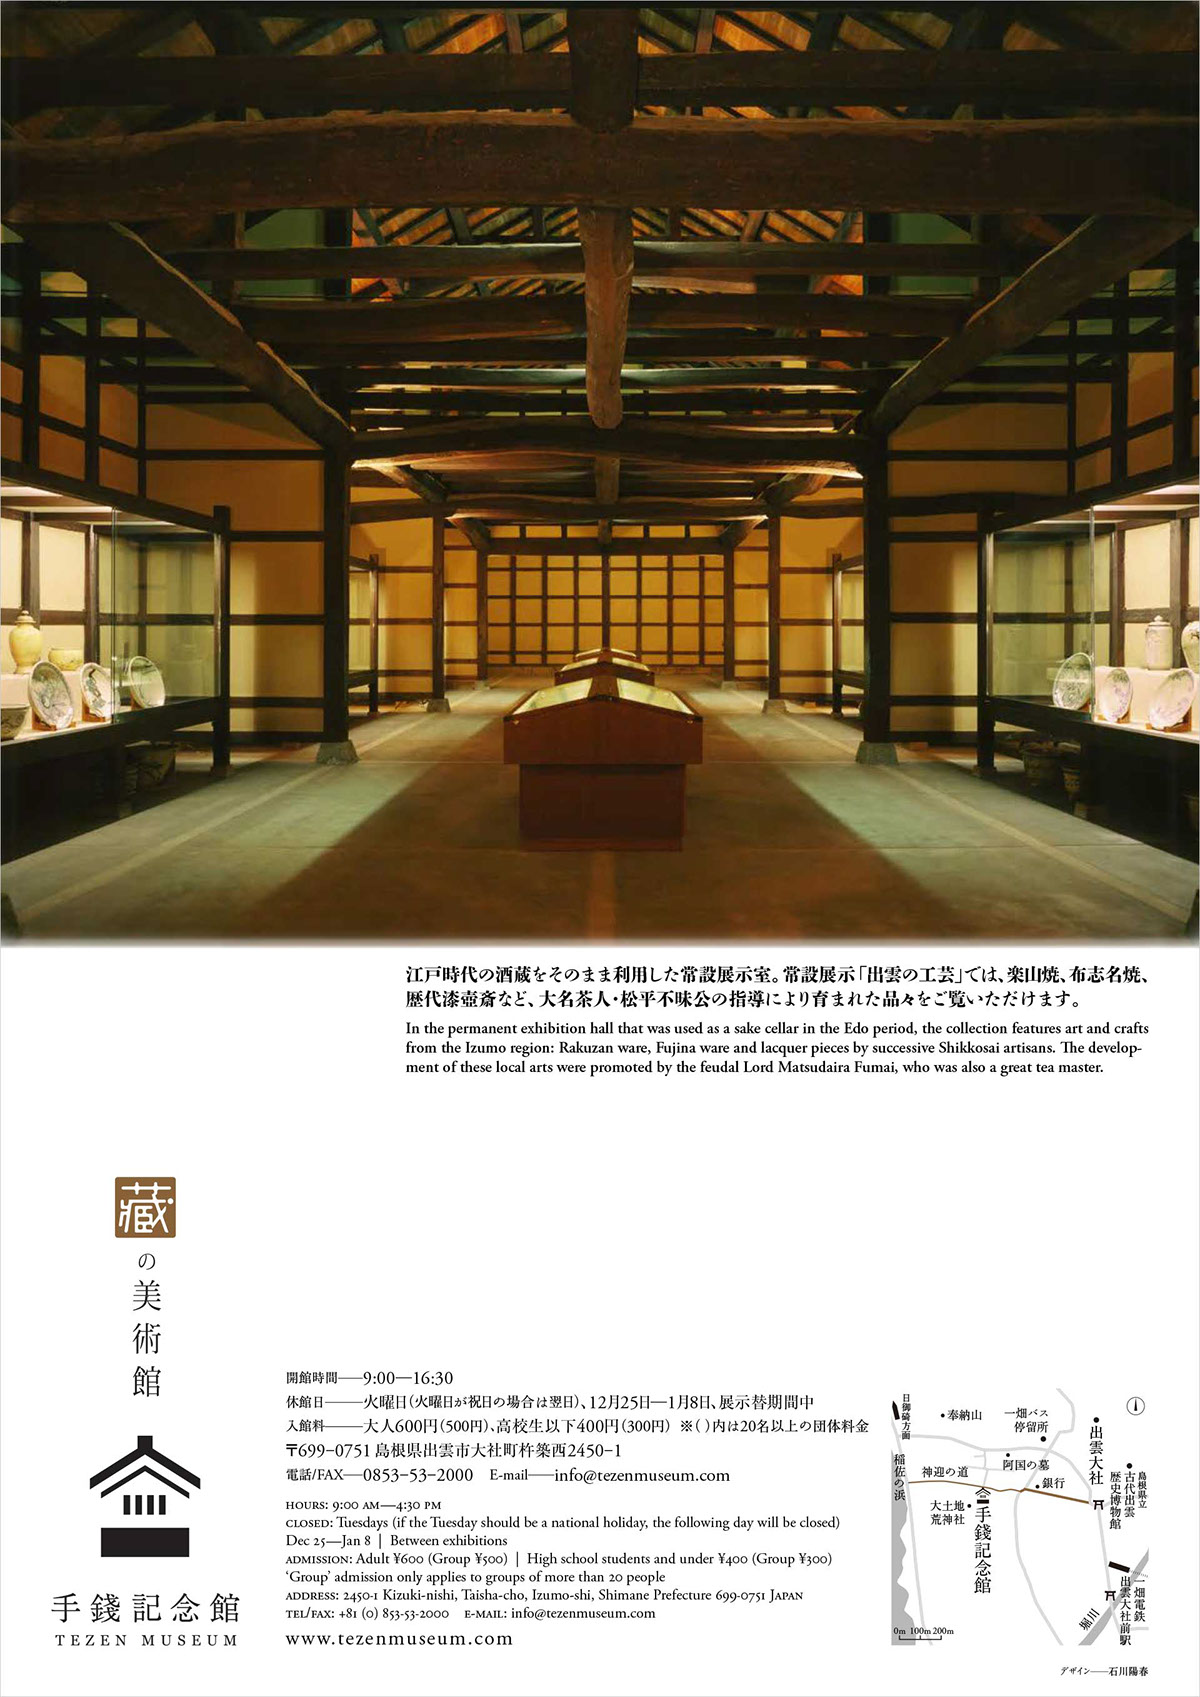 Tezen Museum izumo Taisha 手錢記念館 出雲 大社 工芸 美術 Japanese Craft Japanese fine arts 石川陽春 Ishikawa Kiyoharu